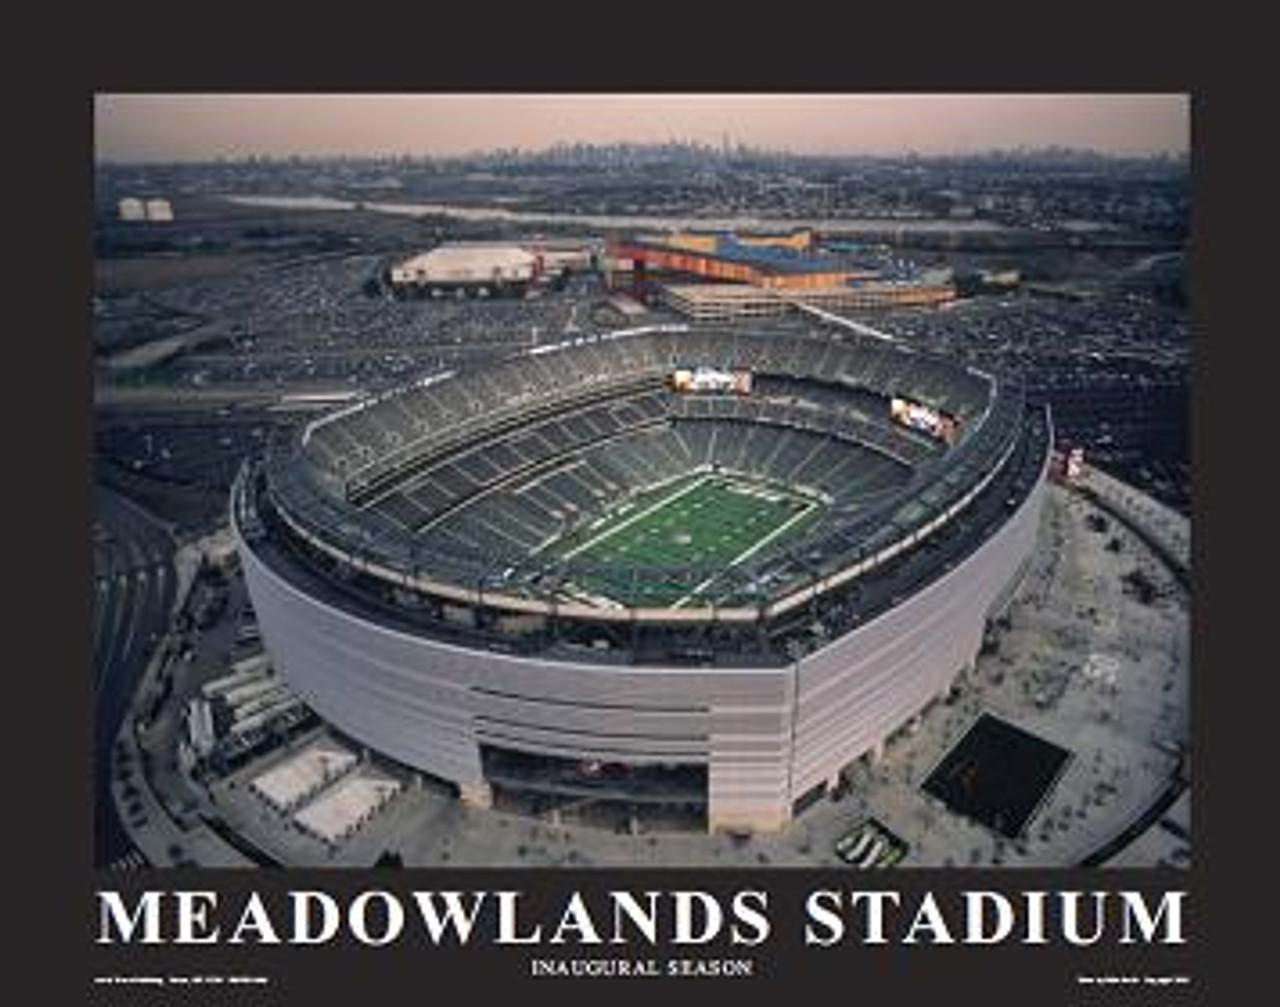 MetLife Stadium New York Jets Aerial Poster